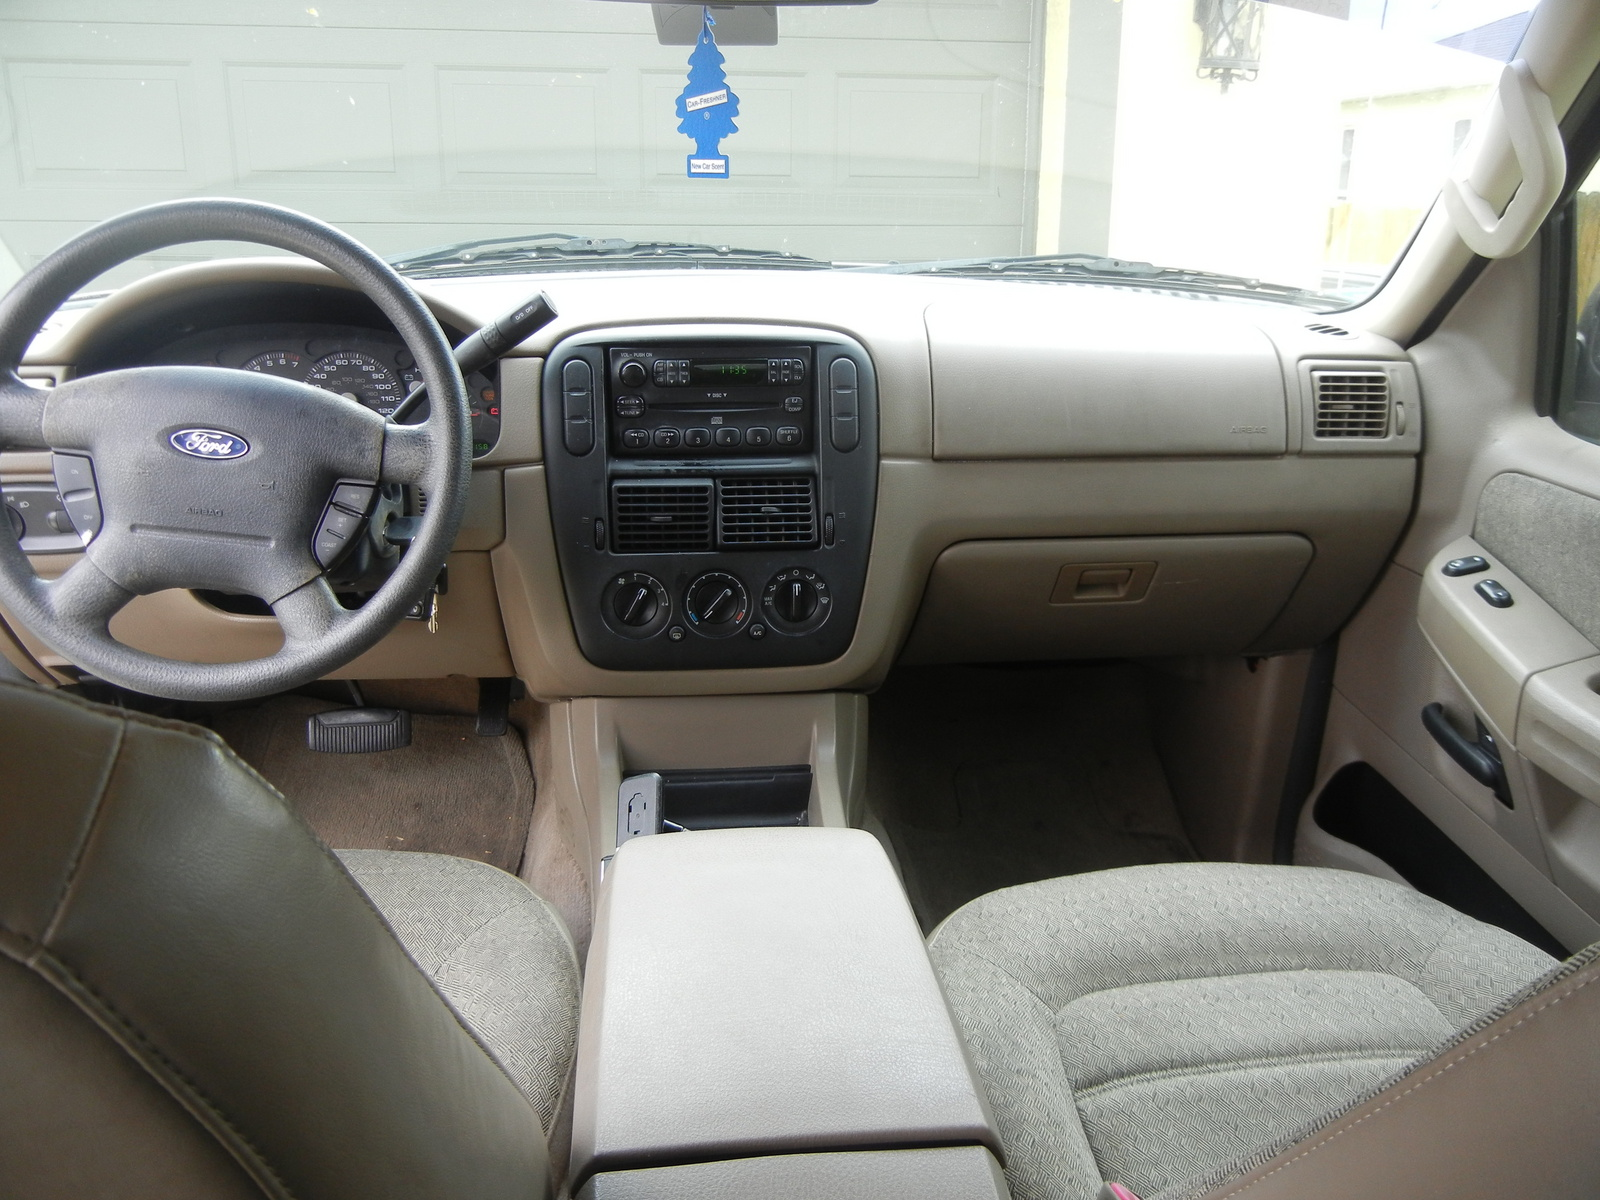 2004 Ford Explorer Interior Carburetor Gallery